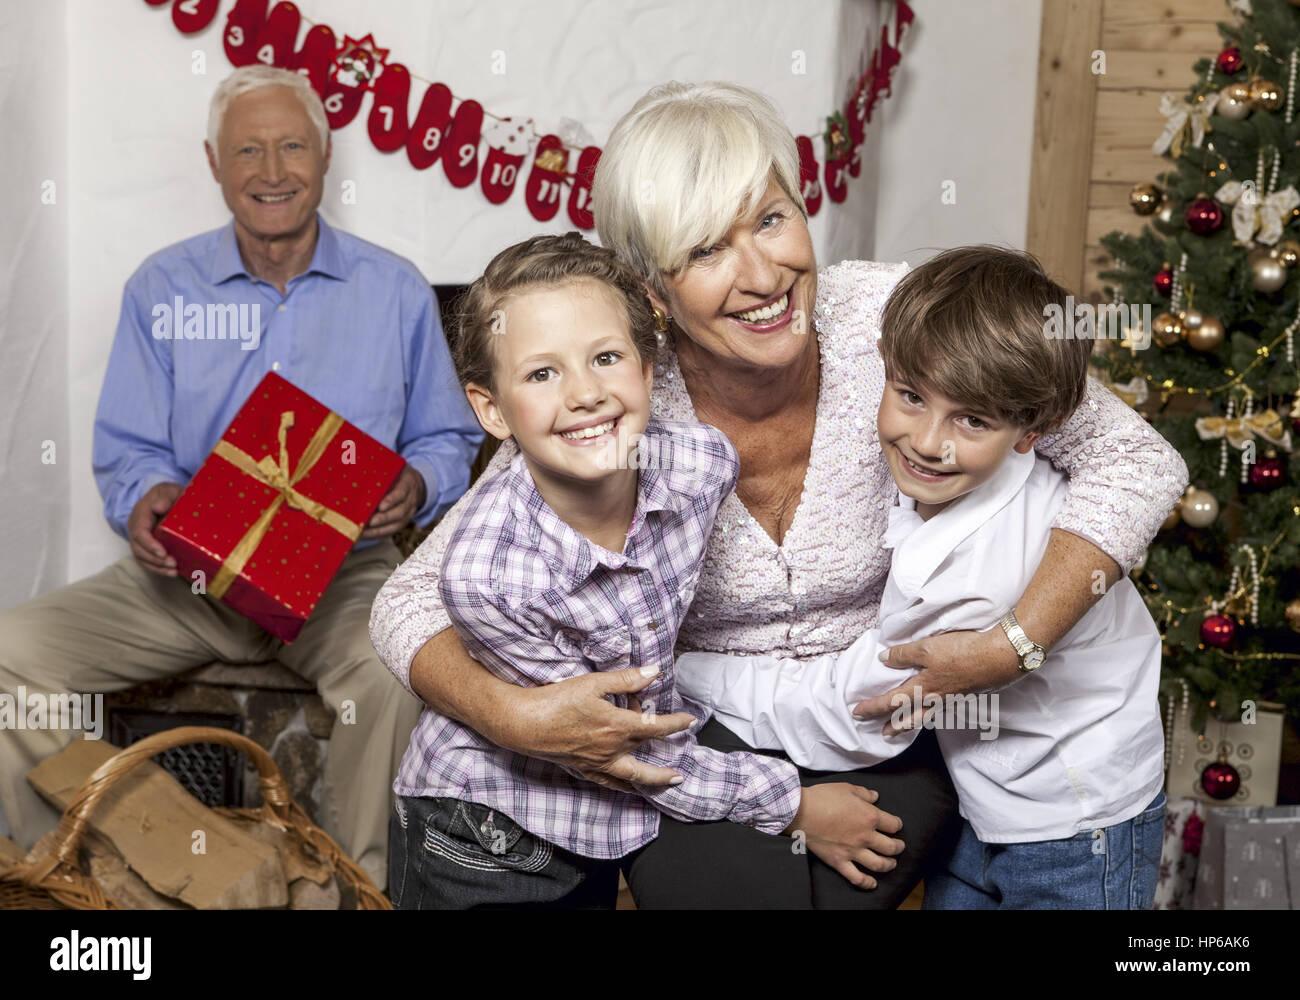 Enkelkinder Stockfotos & Enkelkinder Bilder - Alamy